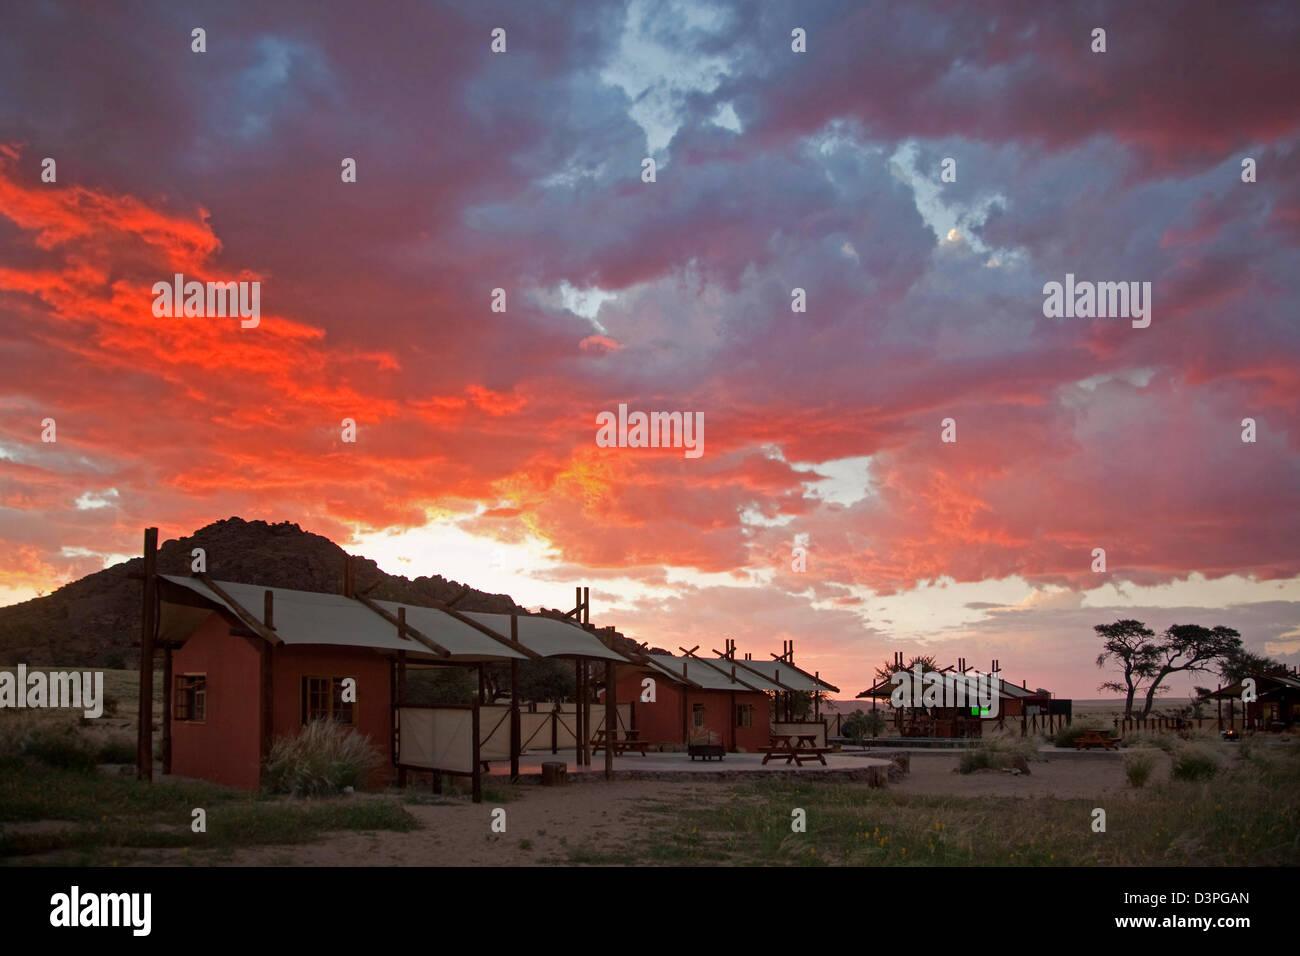 Desert Camp lodges at sunset near Sossusvlei, Namib-Naukluft, Namibia, South Africa - Stock Image